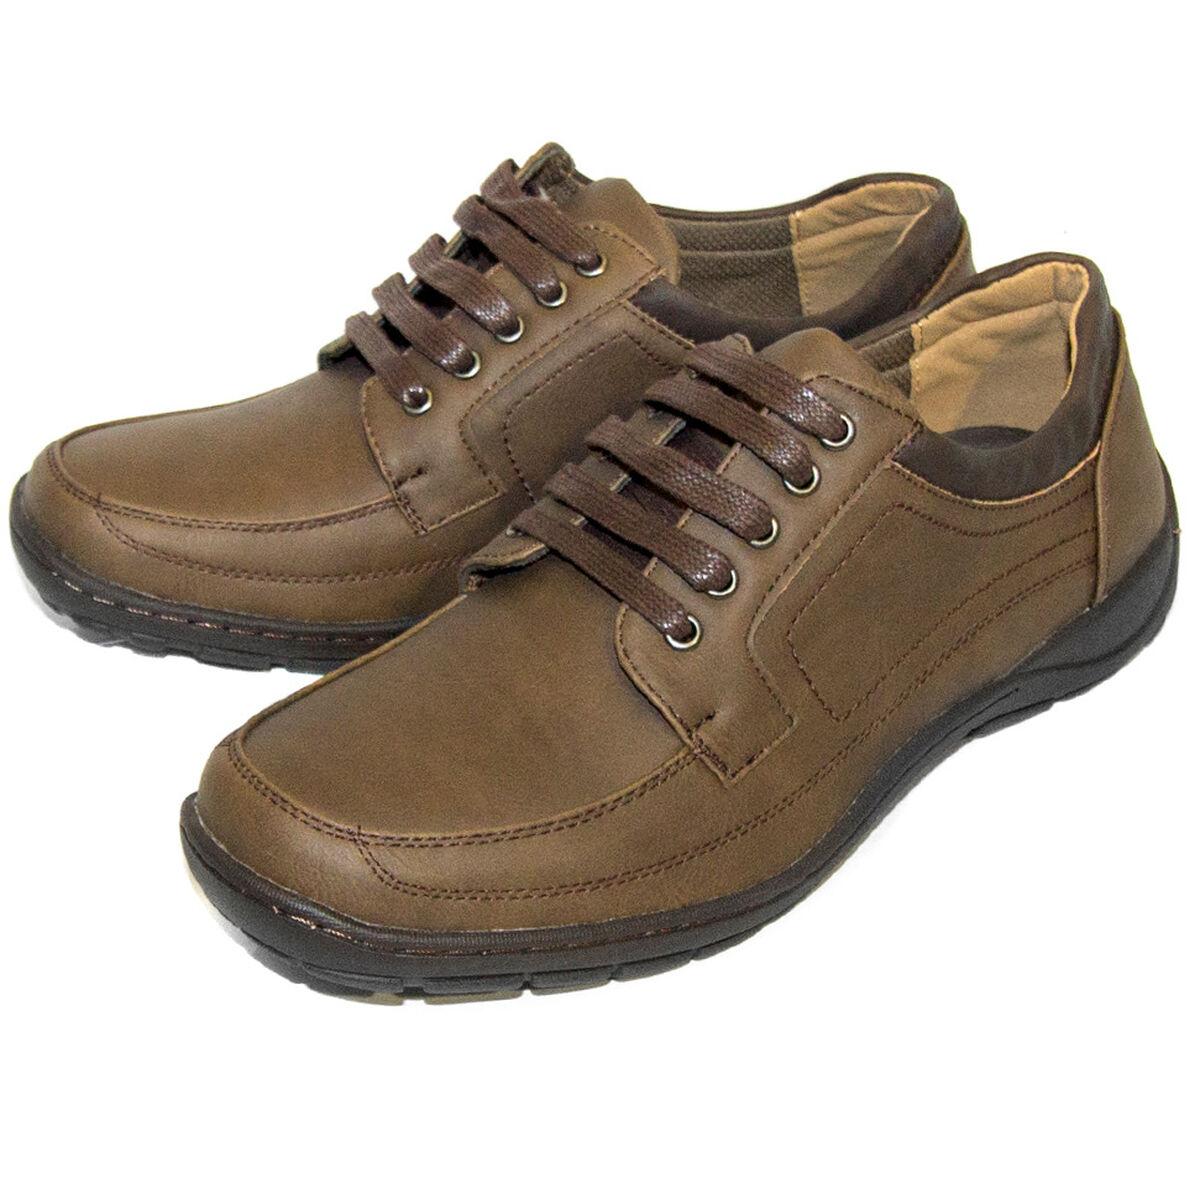 Zapato Portman Basic Hombre Casual Rocky